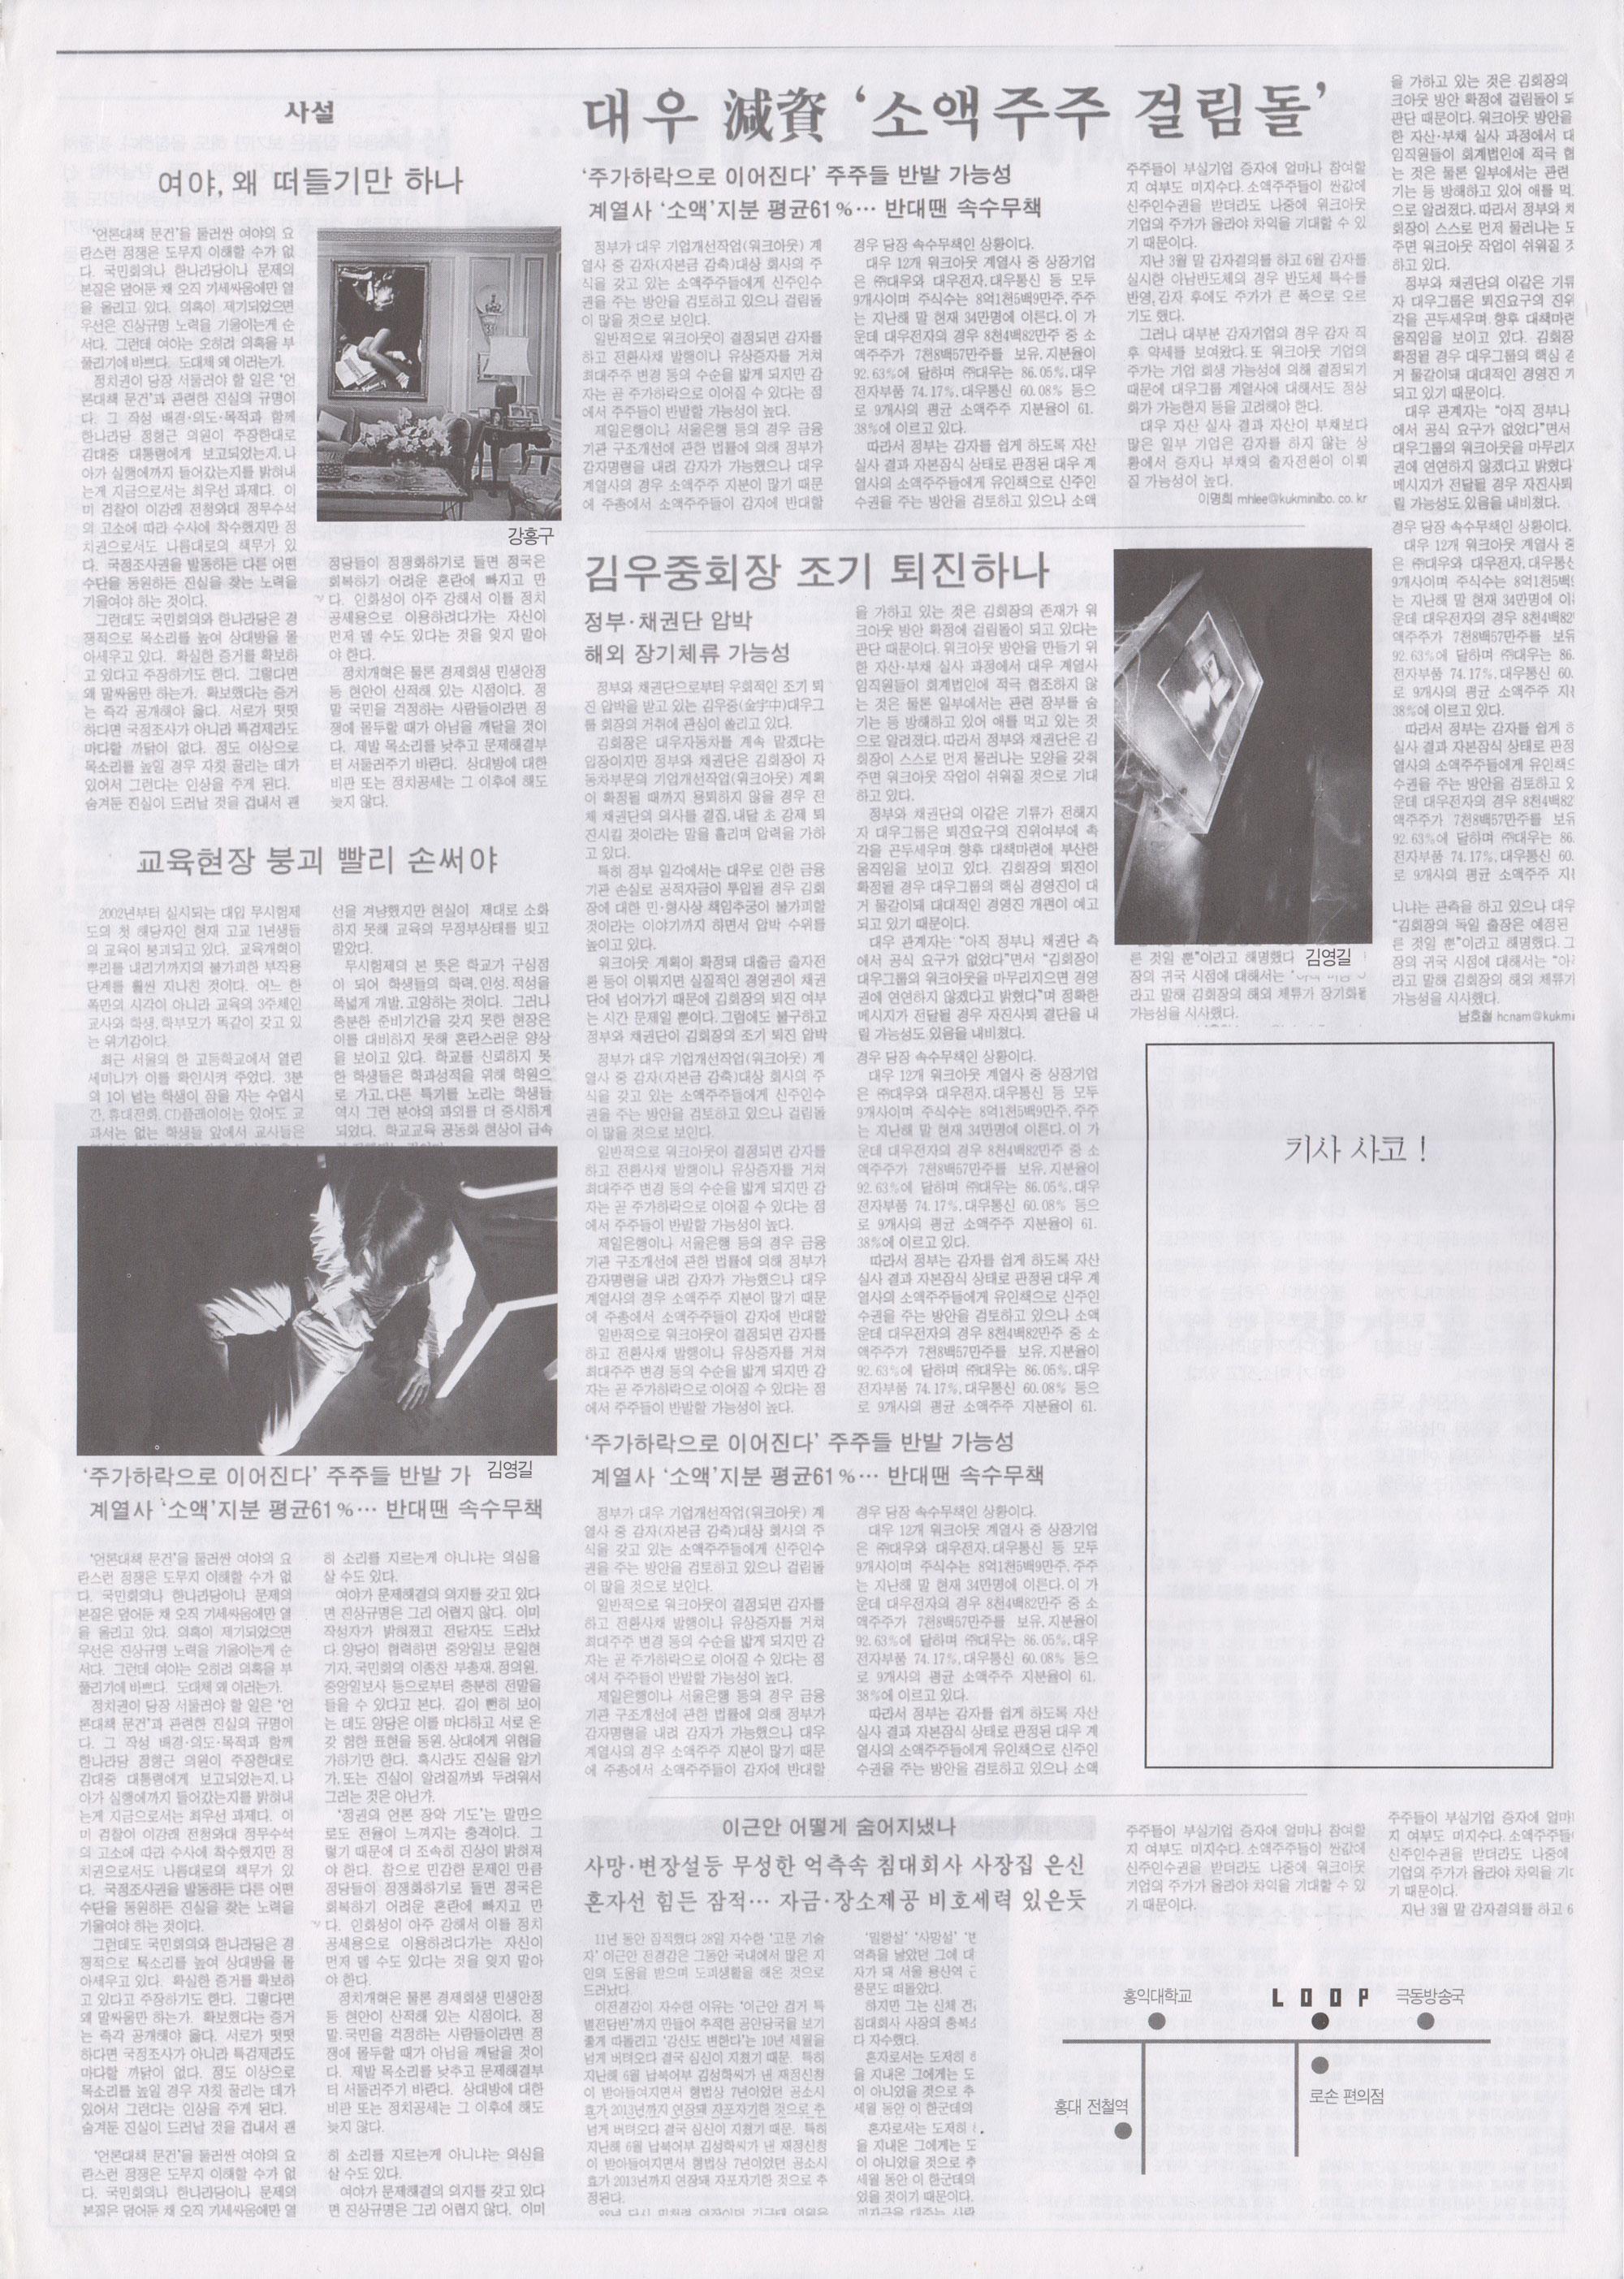 Crime Photo Show: Hong Goo Kang, Yeong Gil Kim, Chang Jun Lee, Sang Kil Kim